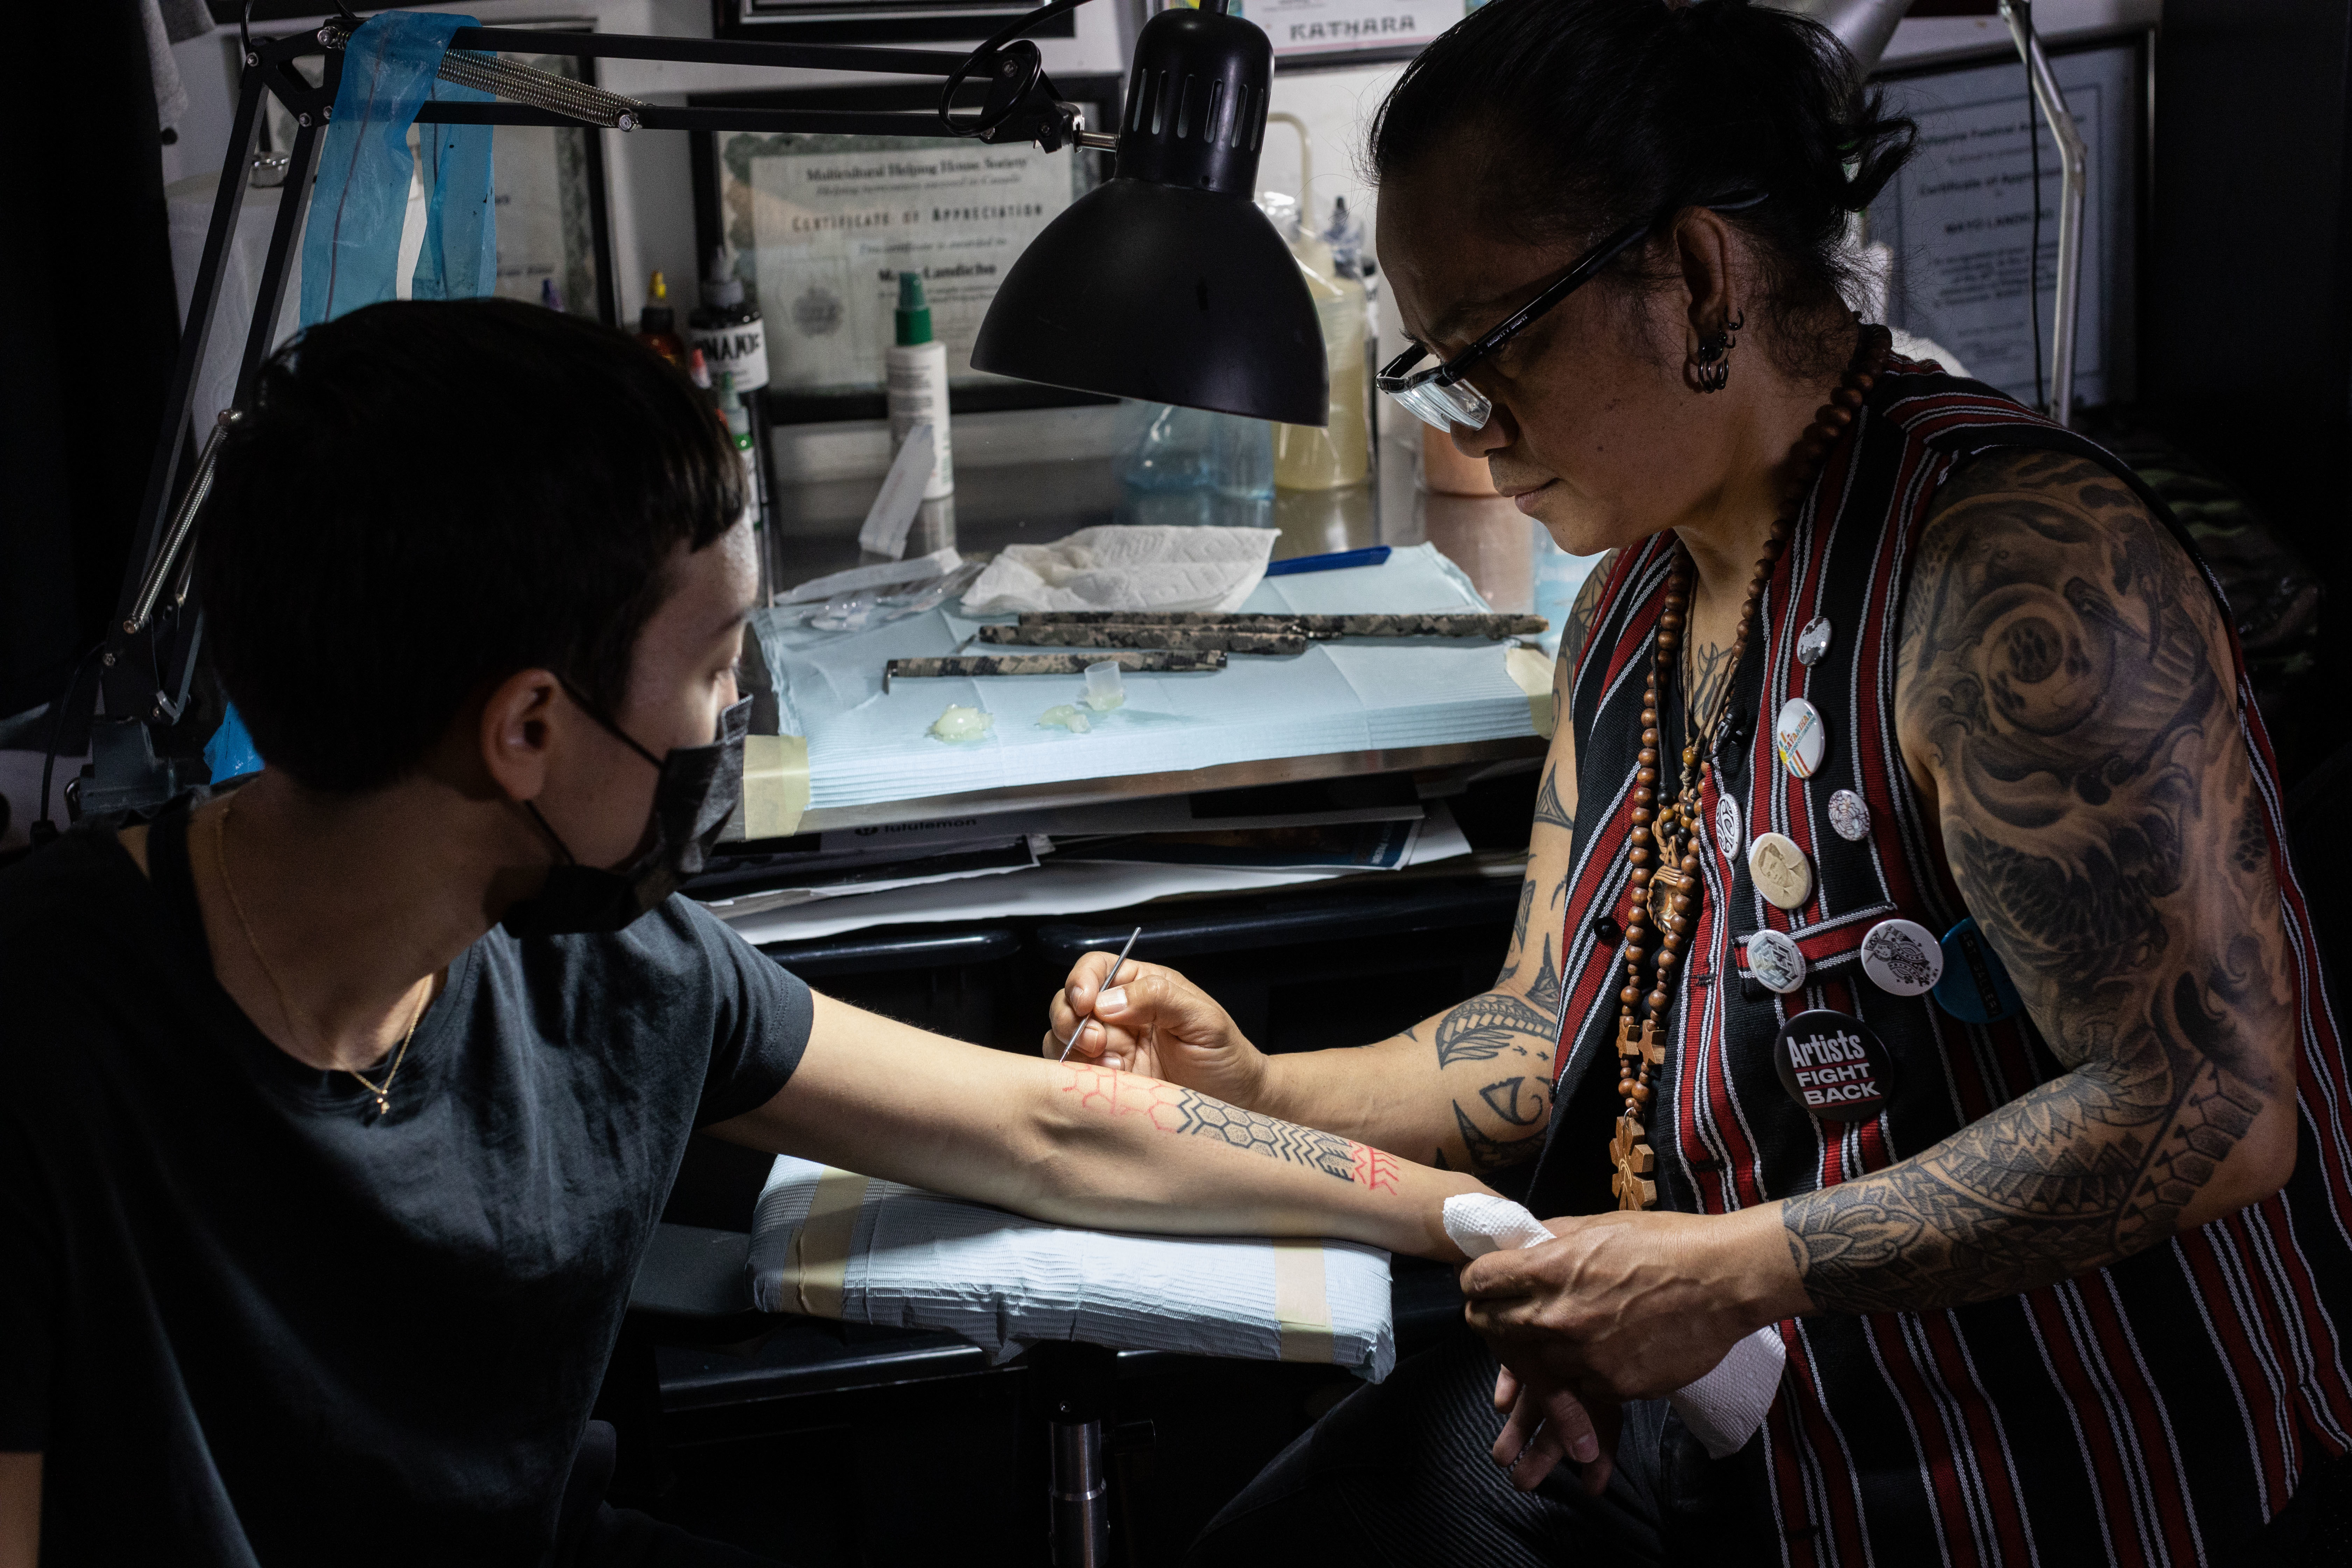 Mayo Landicho, right, sketches out a batok pattern on Jen Angelucci's forearm. (Gian-Paolo Mendoza/CBC)